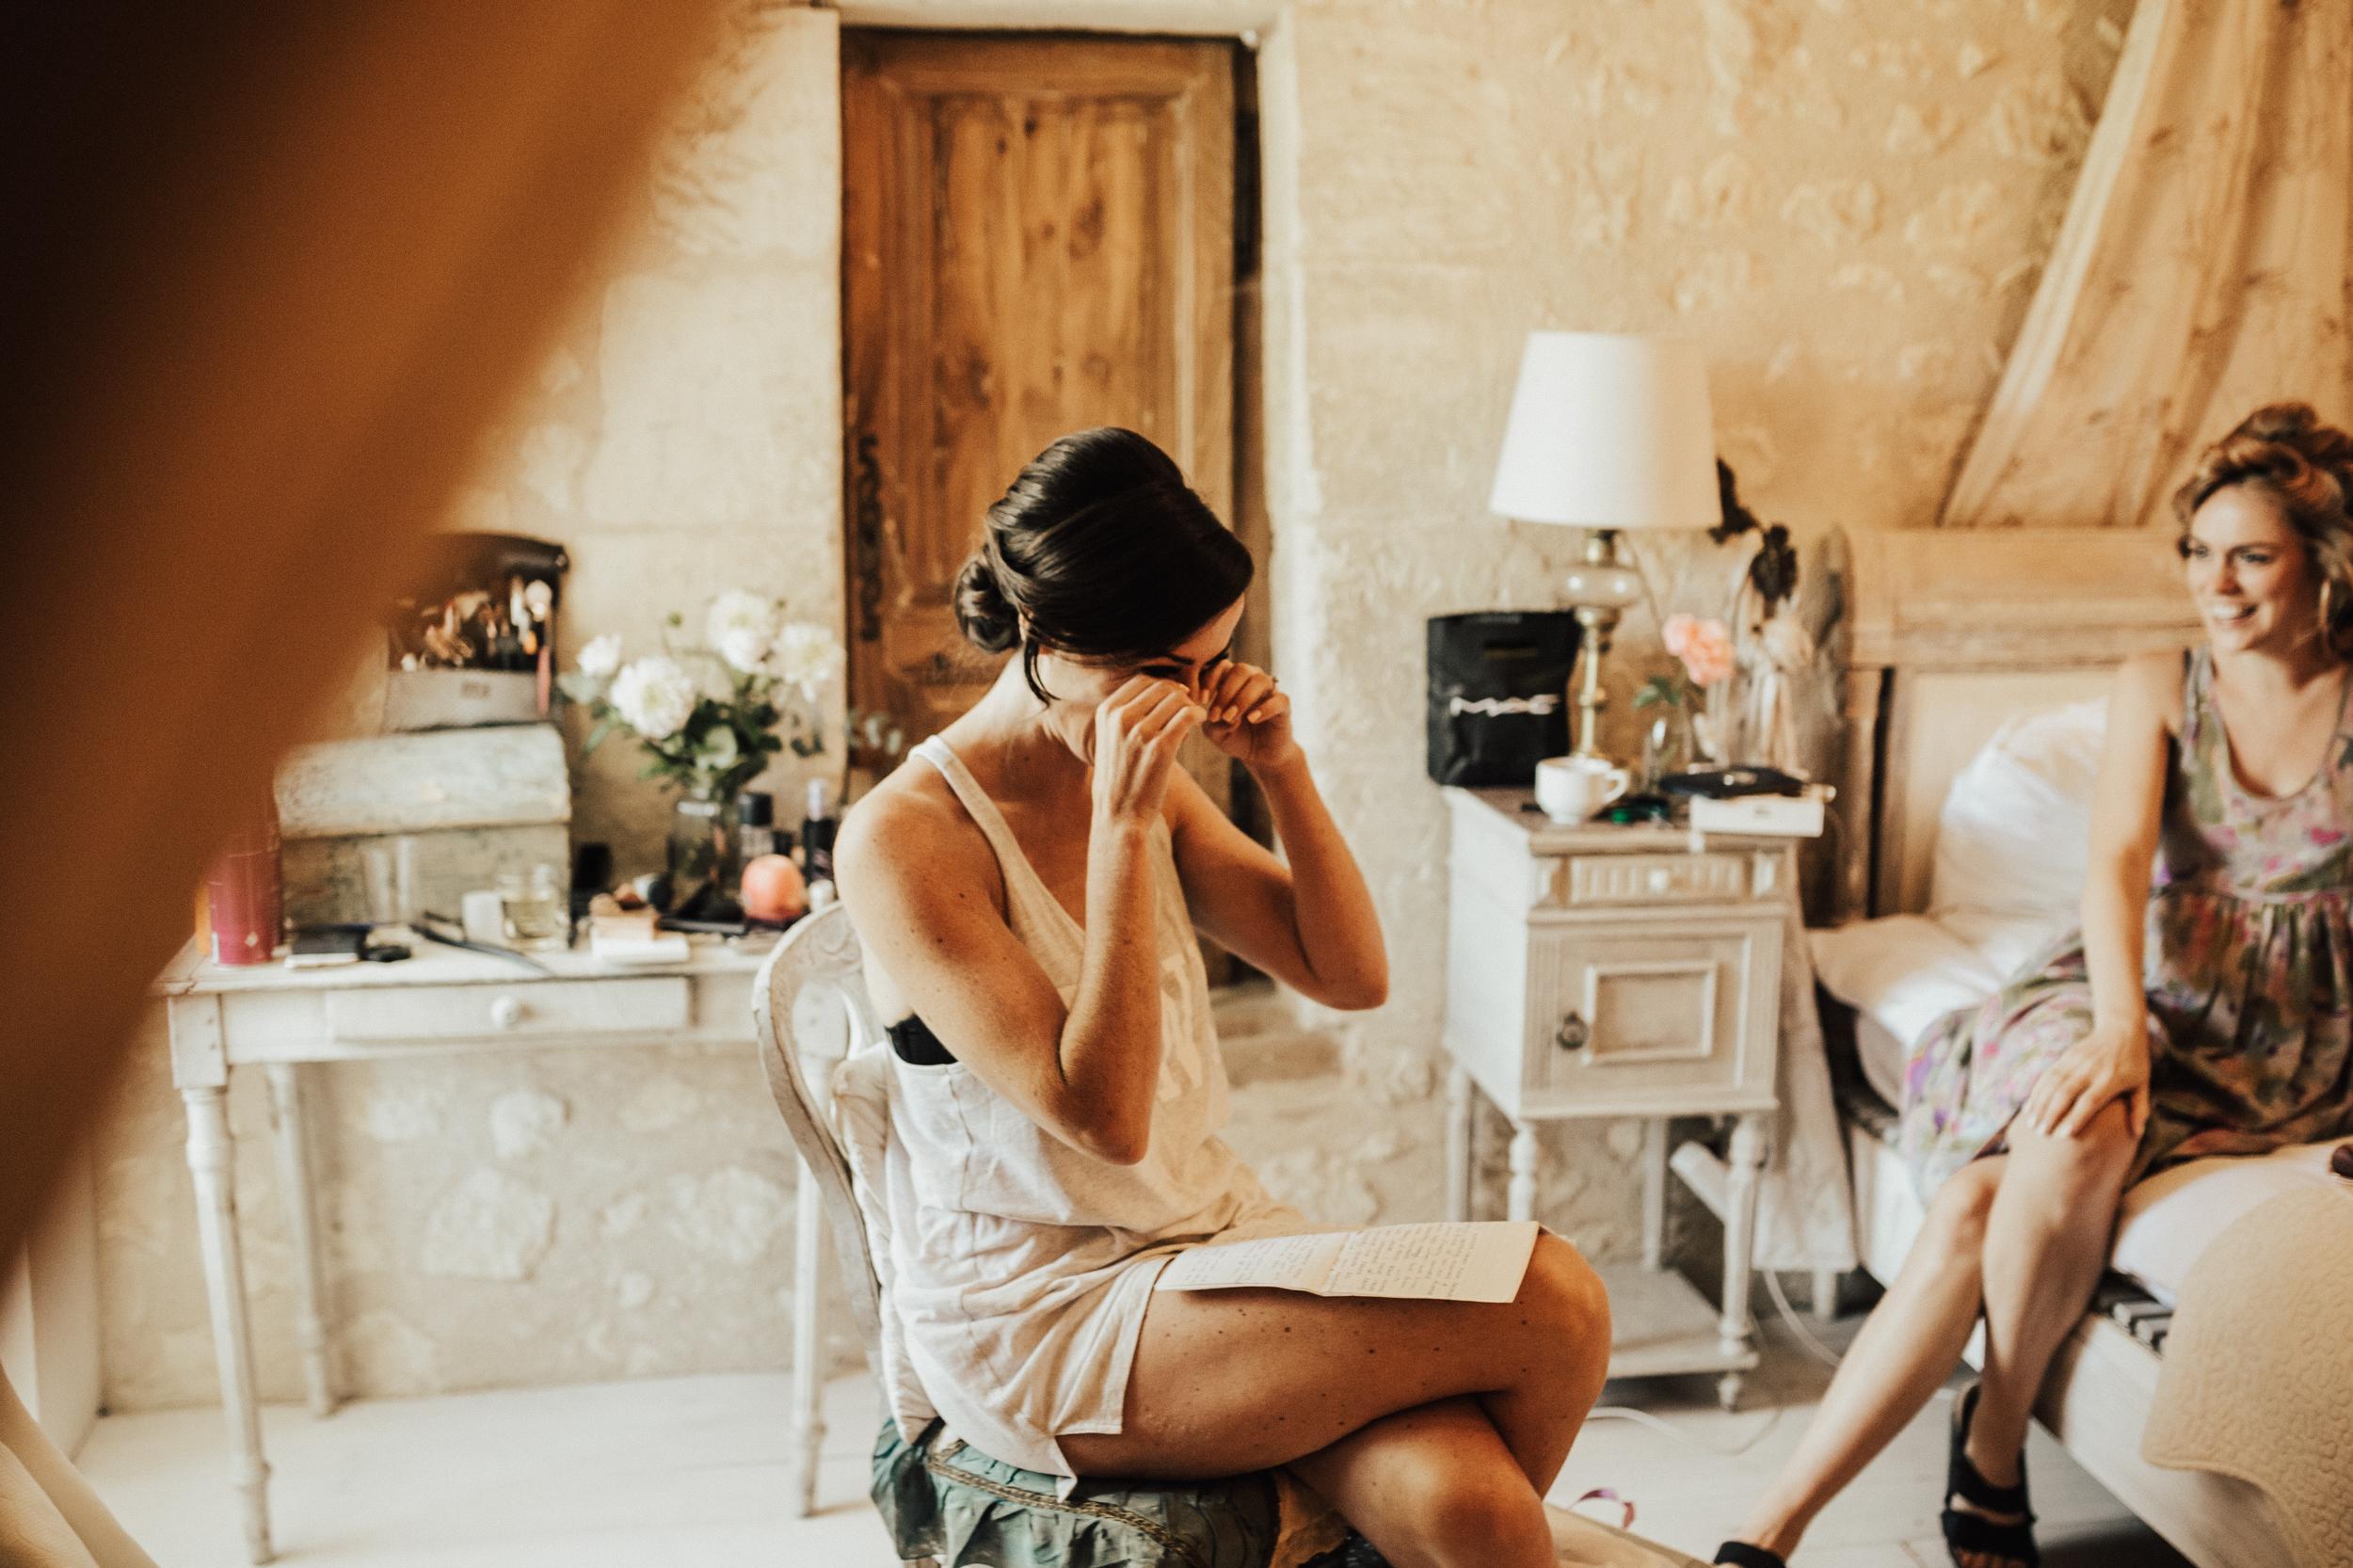 Amy-Zac-Destination-Wedding-France-Manoir-Foulquetiere-Darina-Stoda-Photography-21.jpg